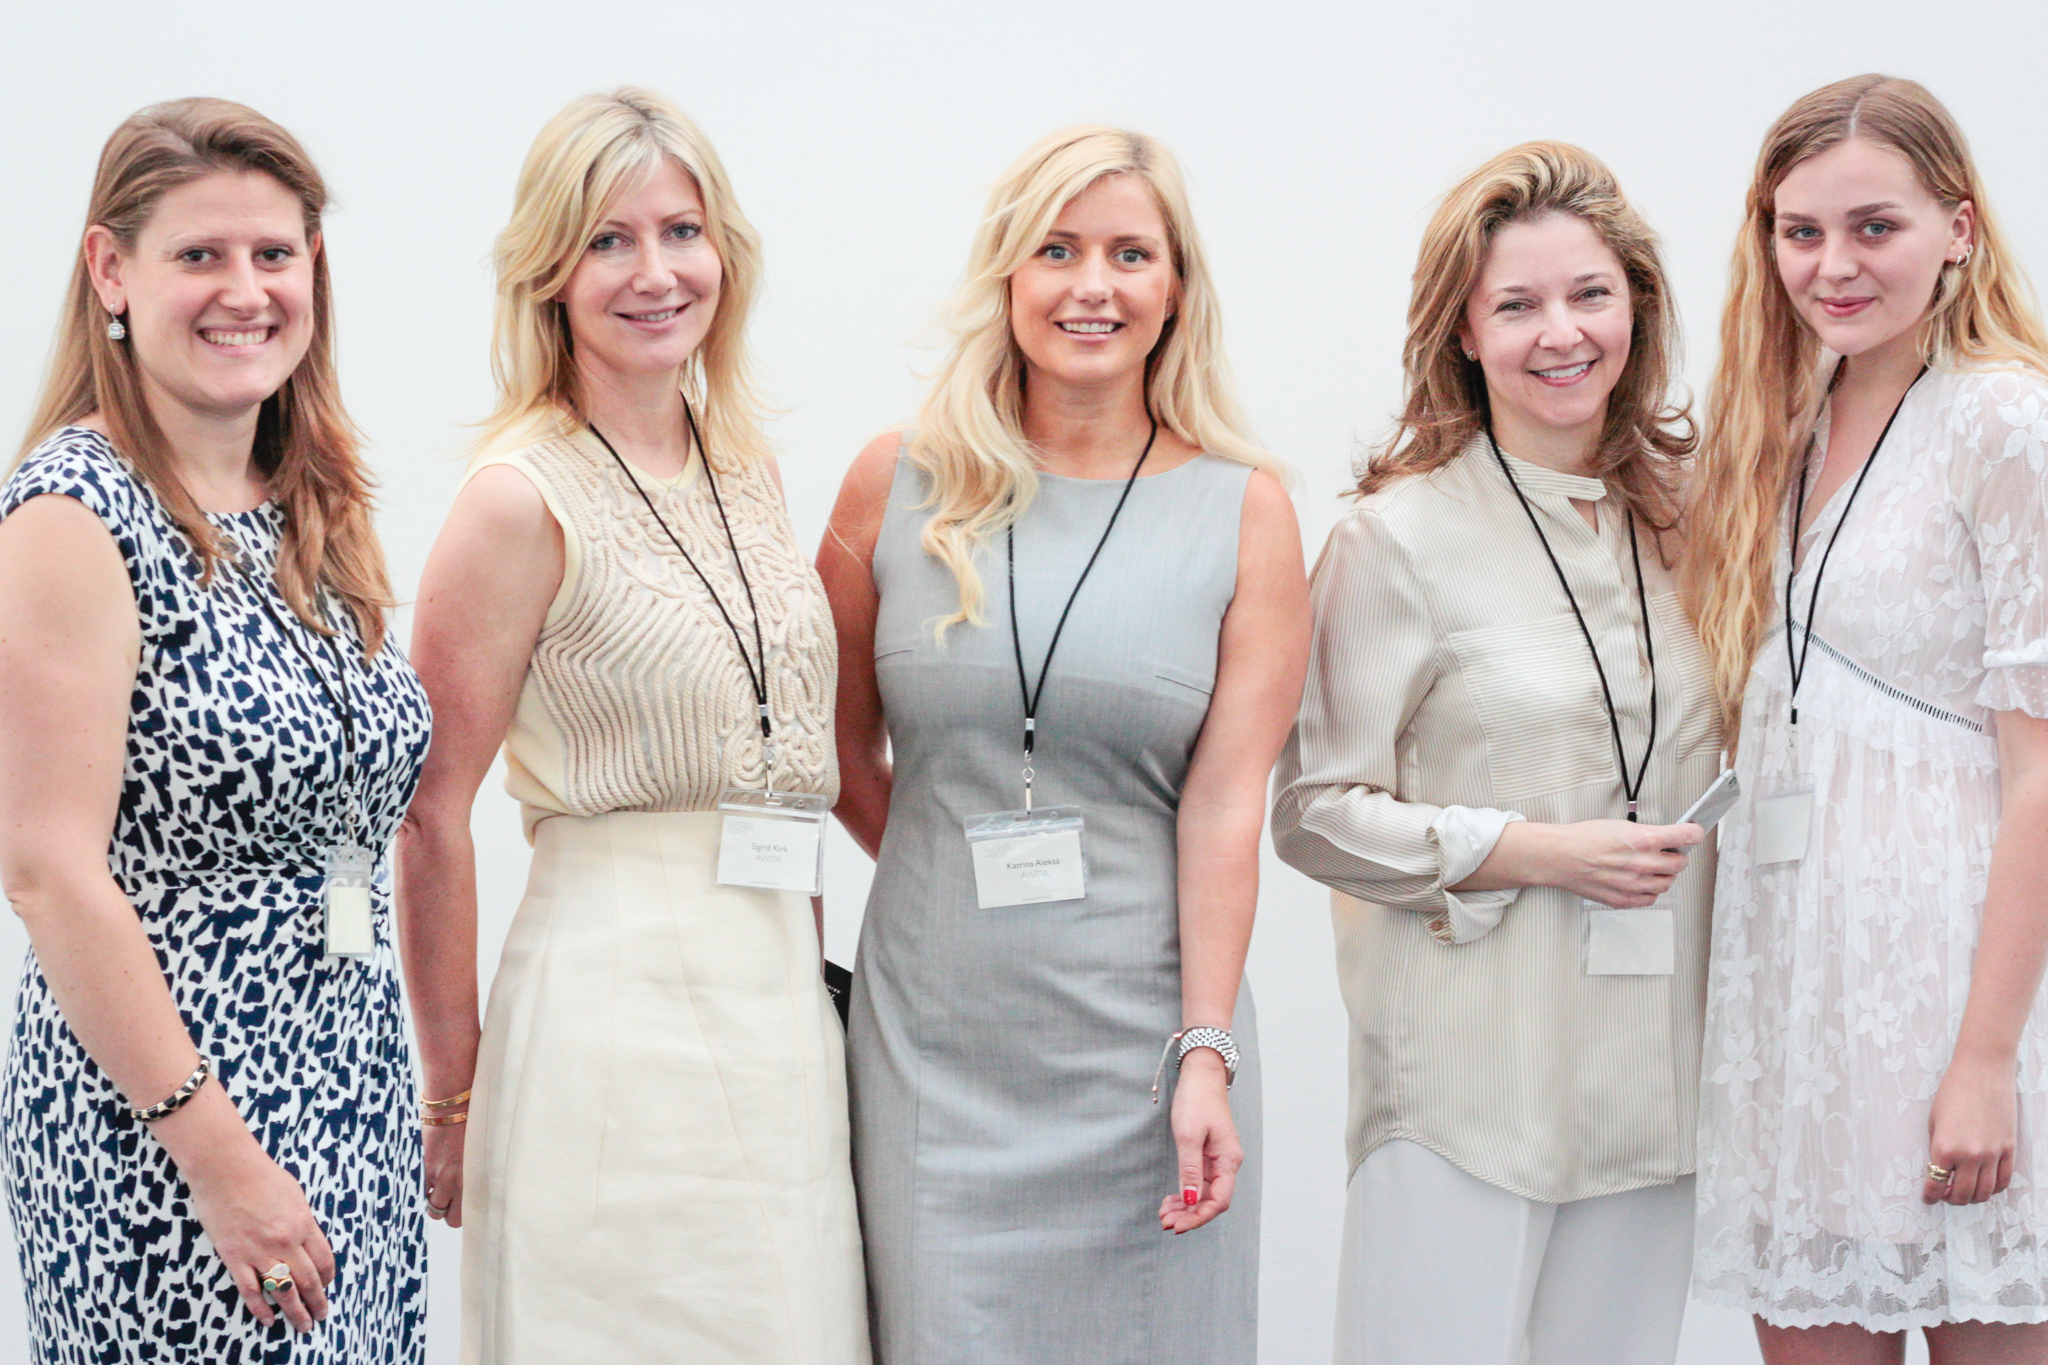 Theodora Clarke, Sigrid Kirk, Katrina Aleksa, Kate Gordon and Hannah Clynch